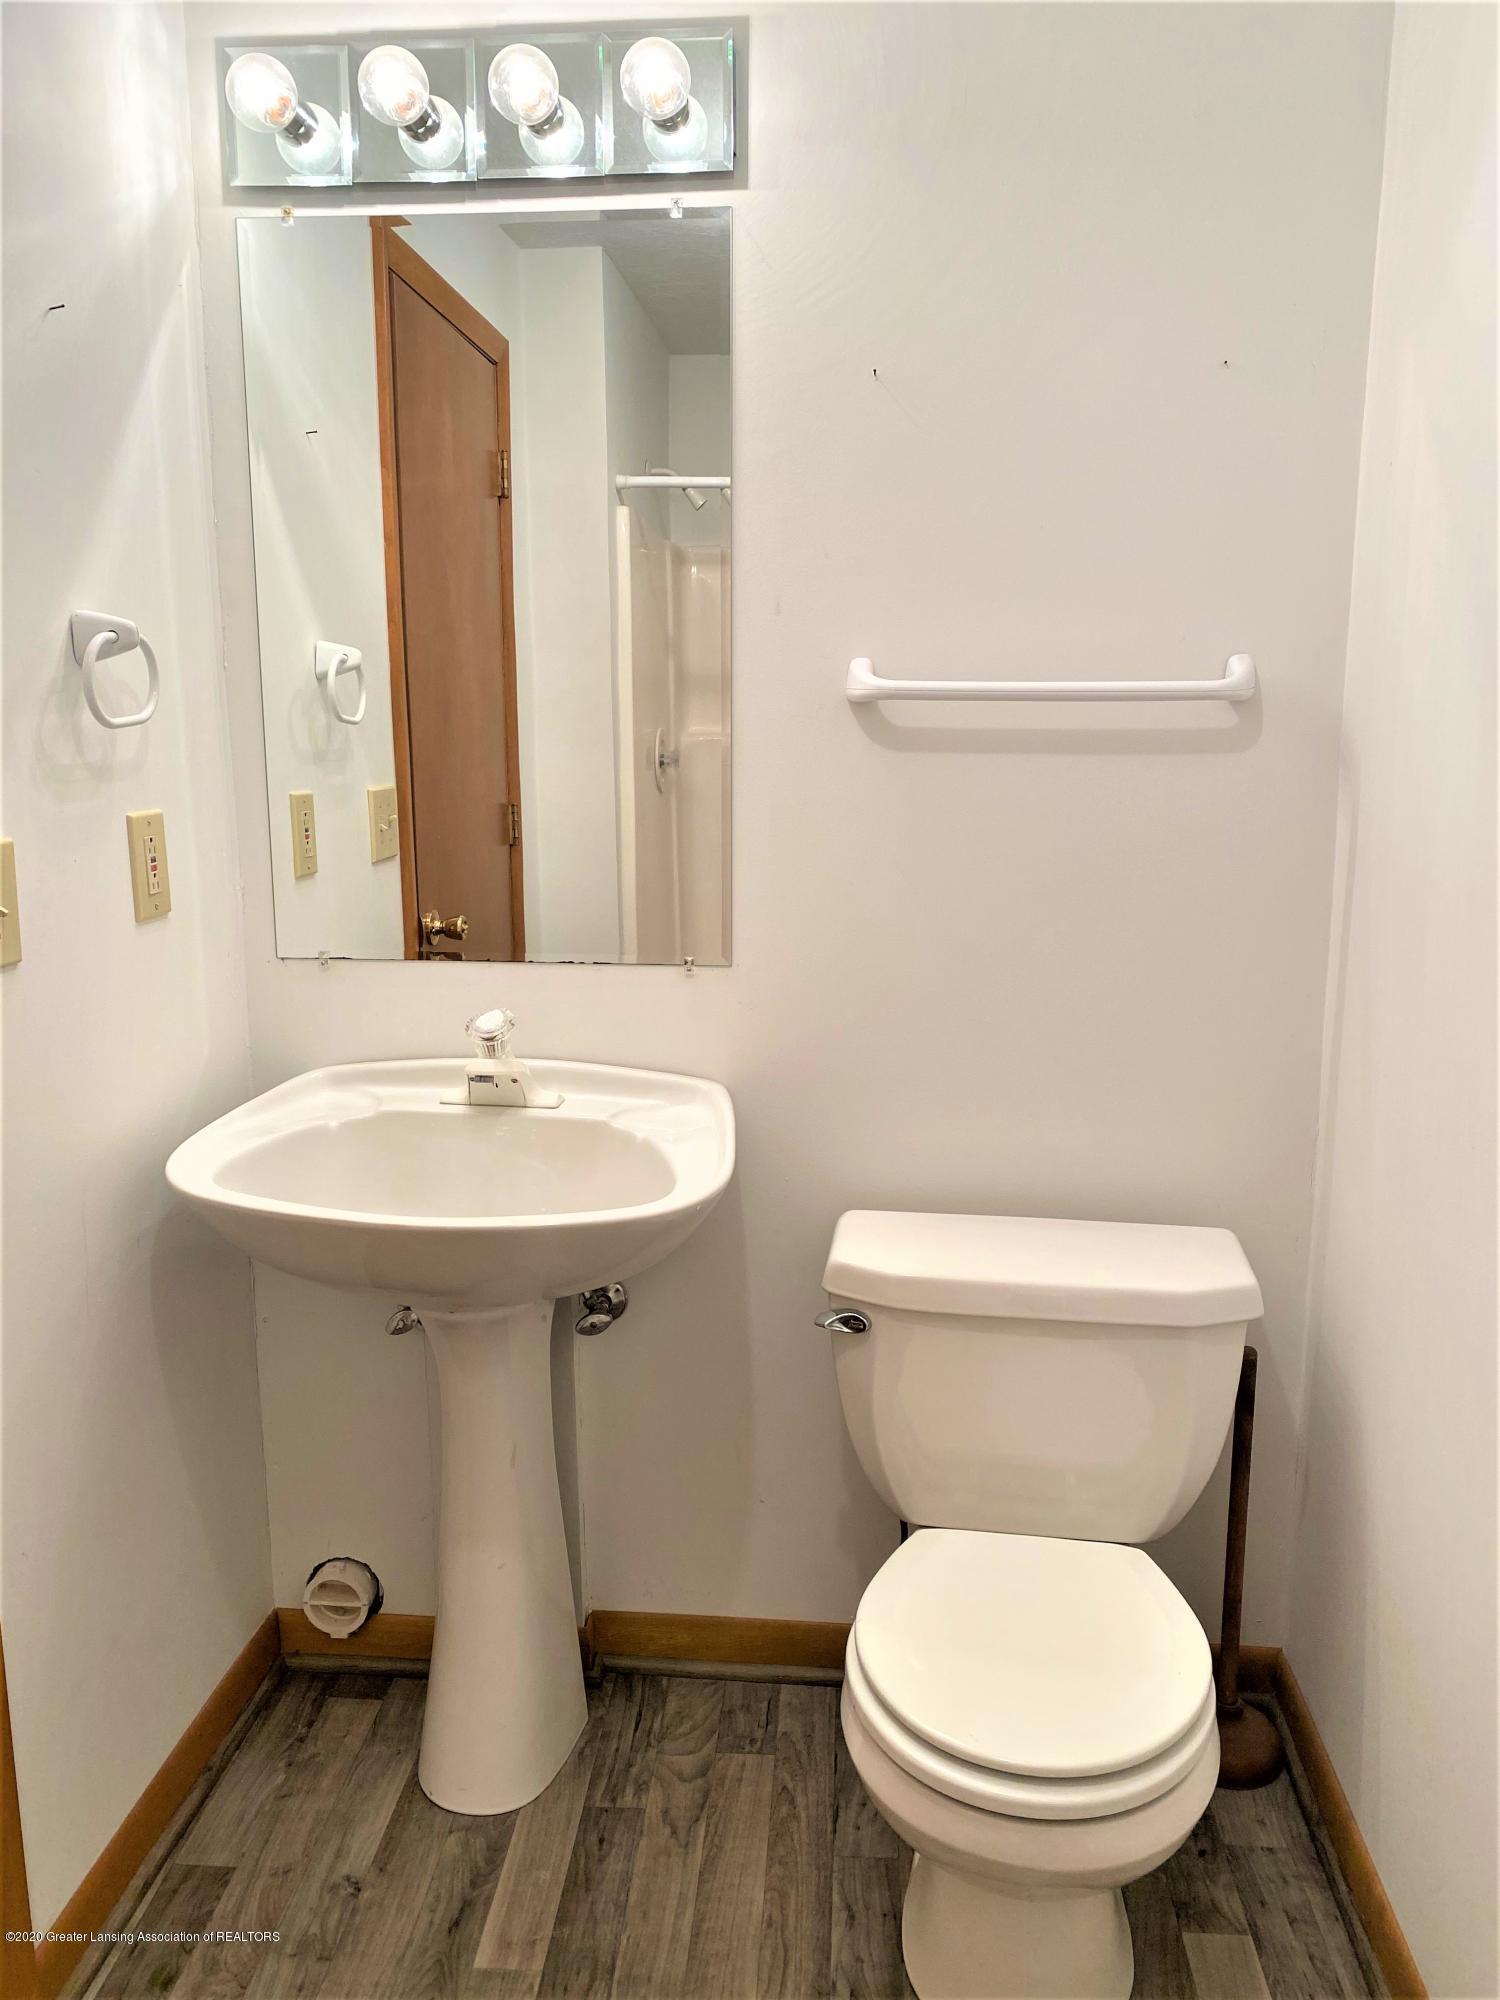 2475 Walenjus Ct - Basement Bath - 35